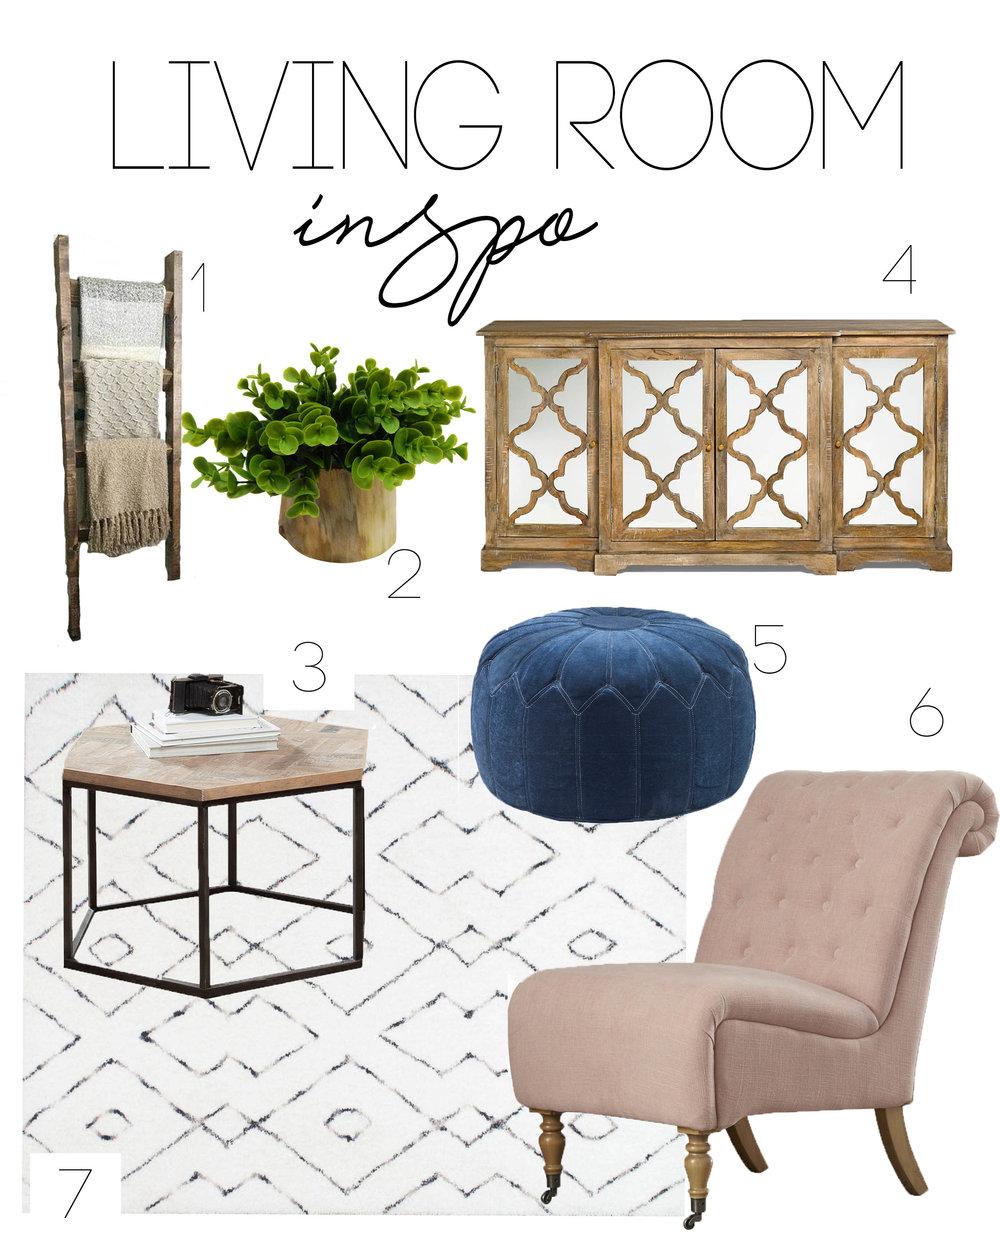 LIVING ROOM INSPO. — CHIC HUNTERS WIFE DESIGN + CO